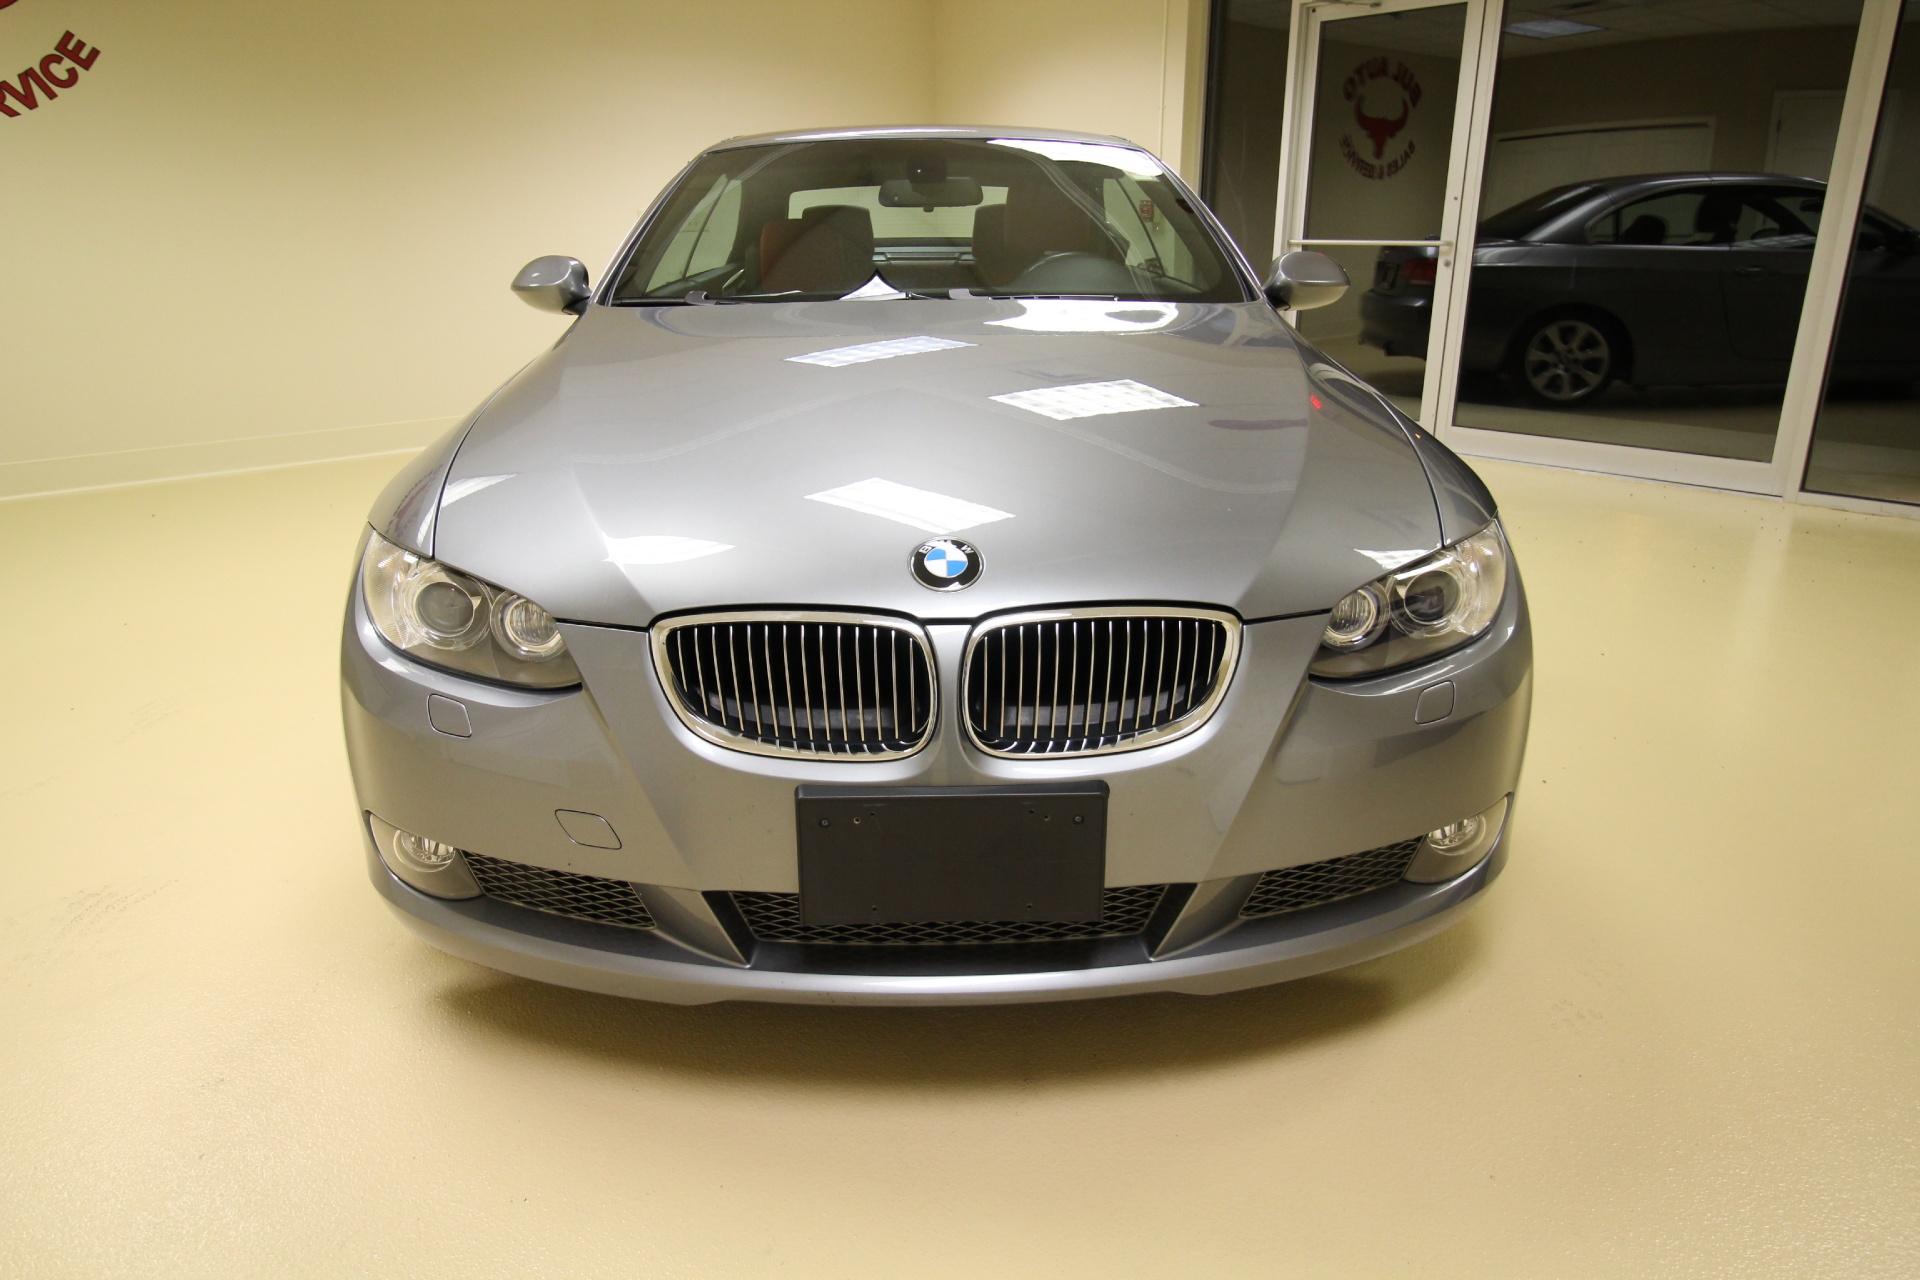 Used 2007 BMW 3 Series 335i RARE 6 SPEED MANUAL,SUPER LOW MILES 35K | Albany, NY